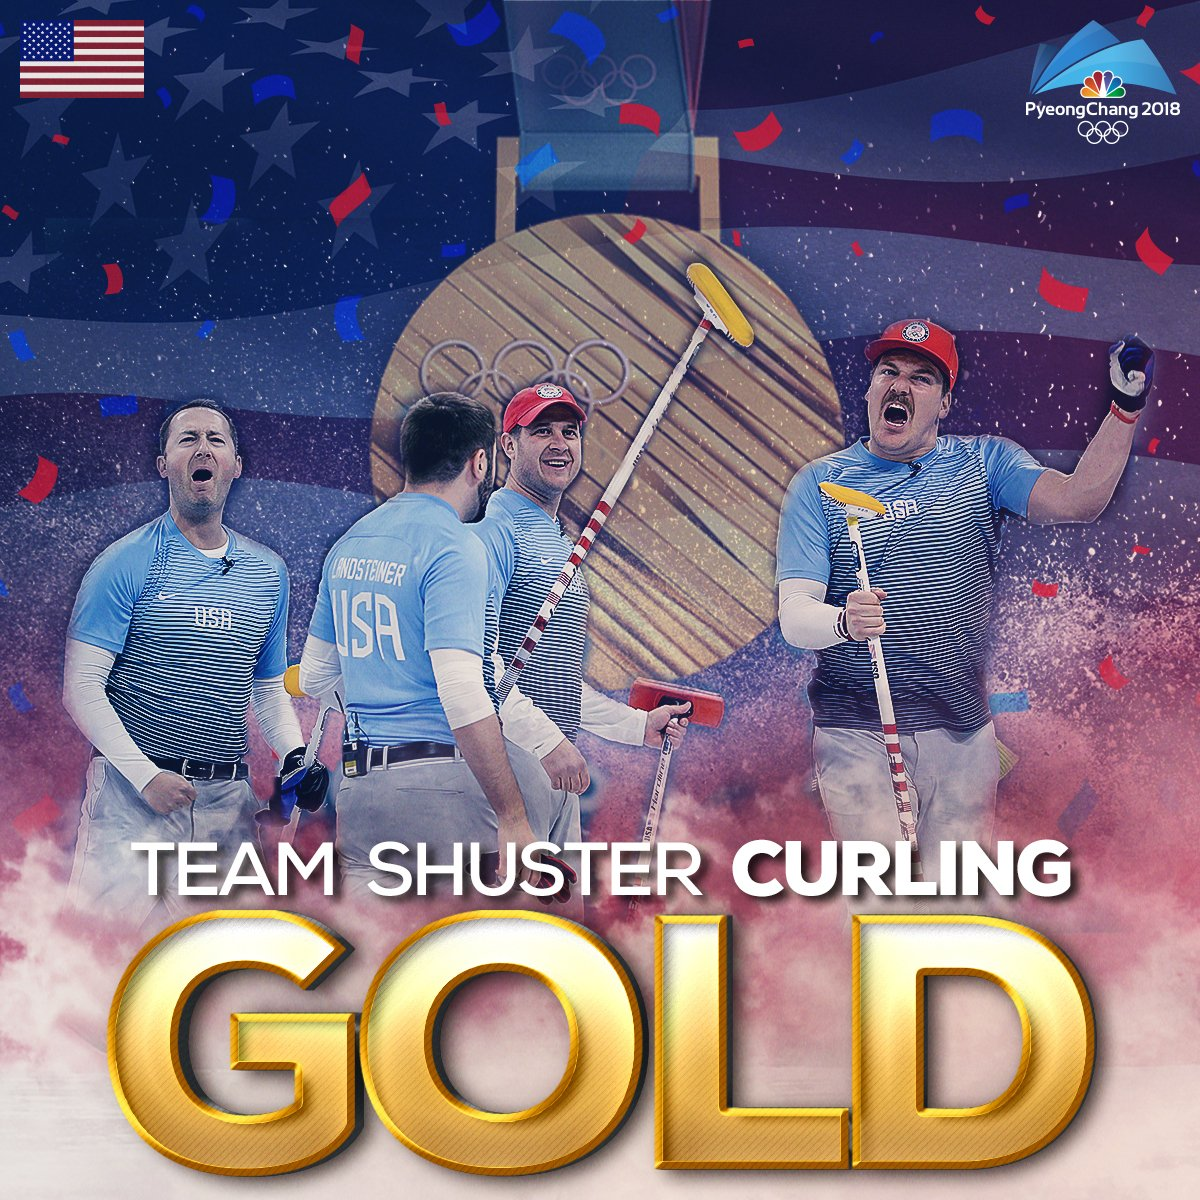 NBCOlympics curling